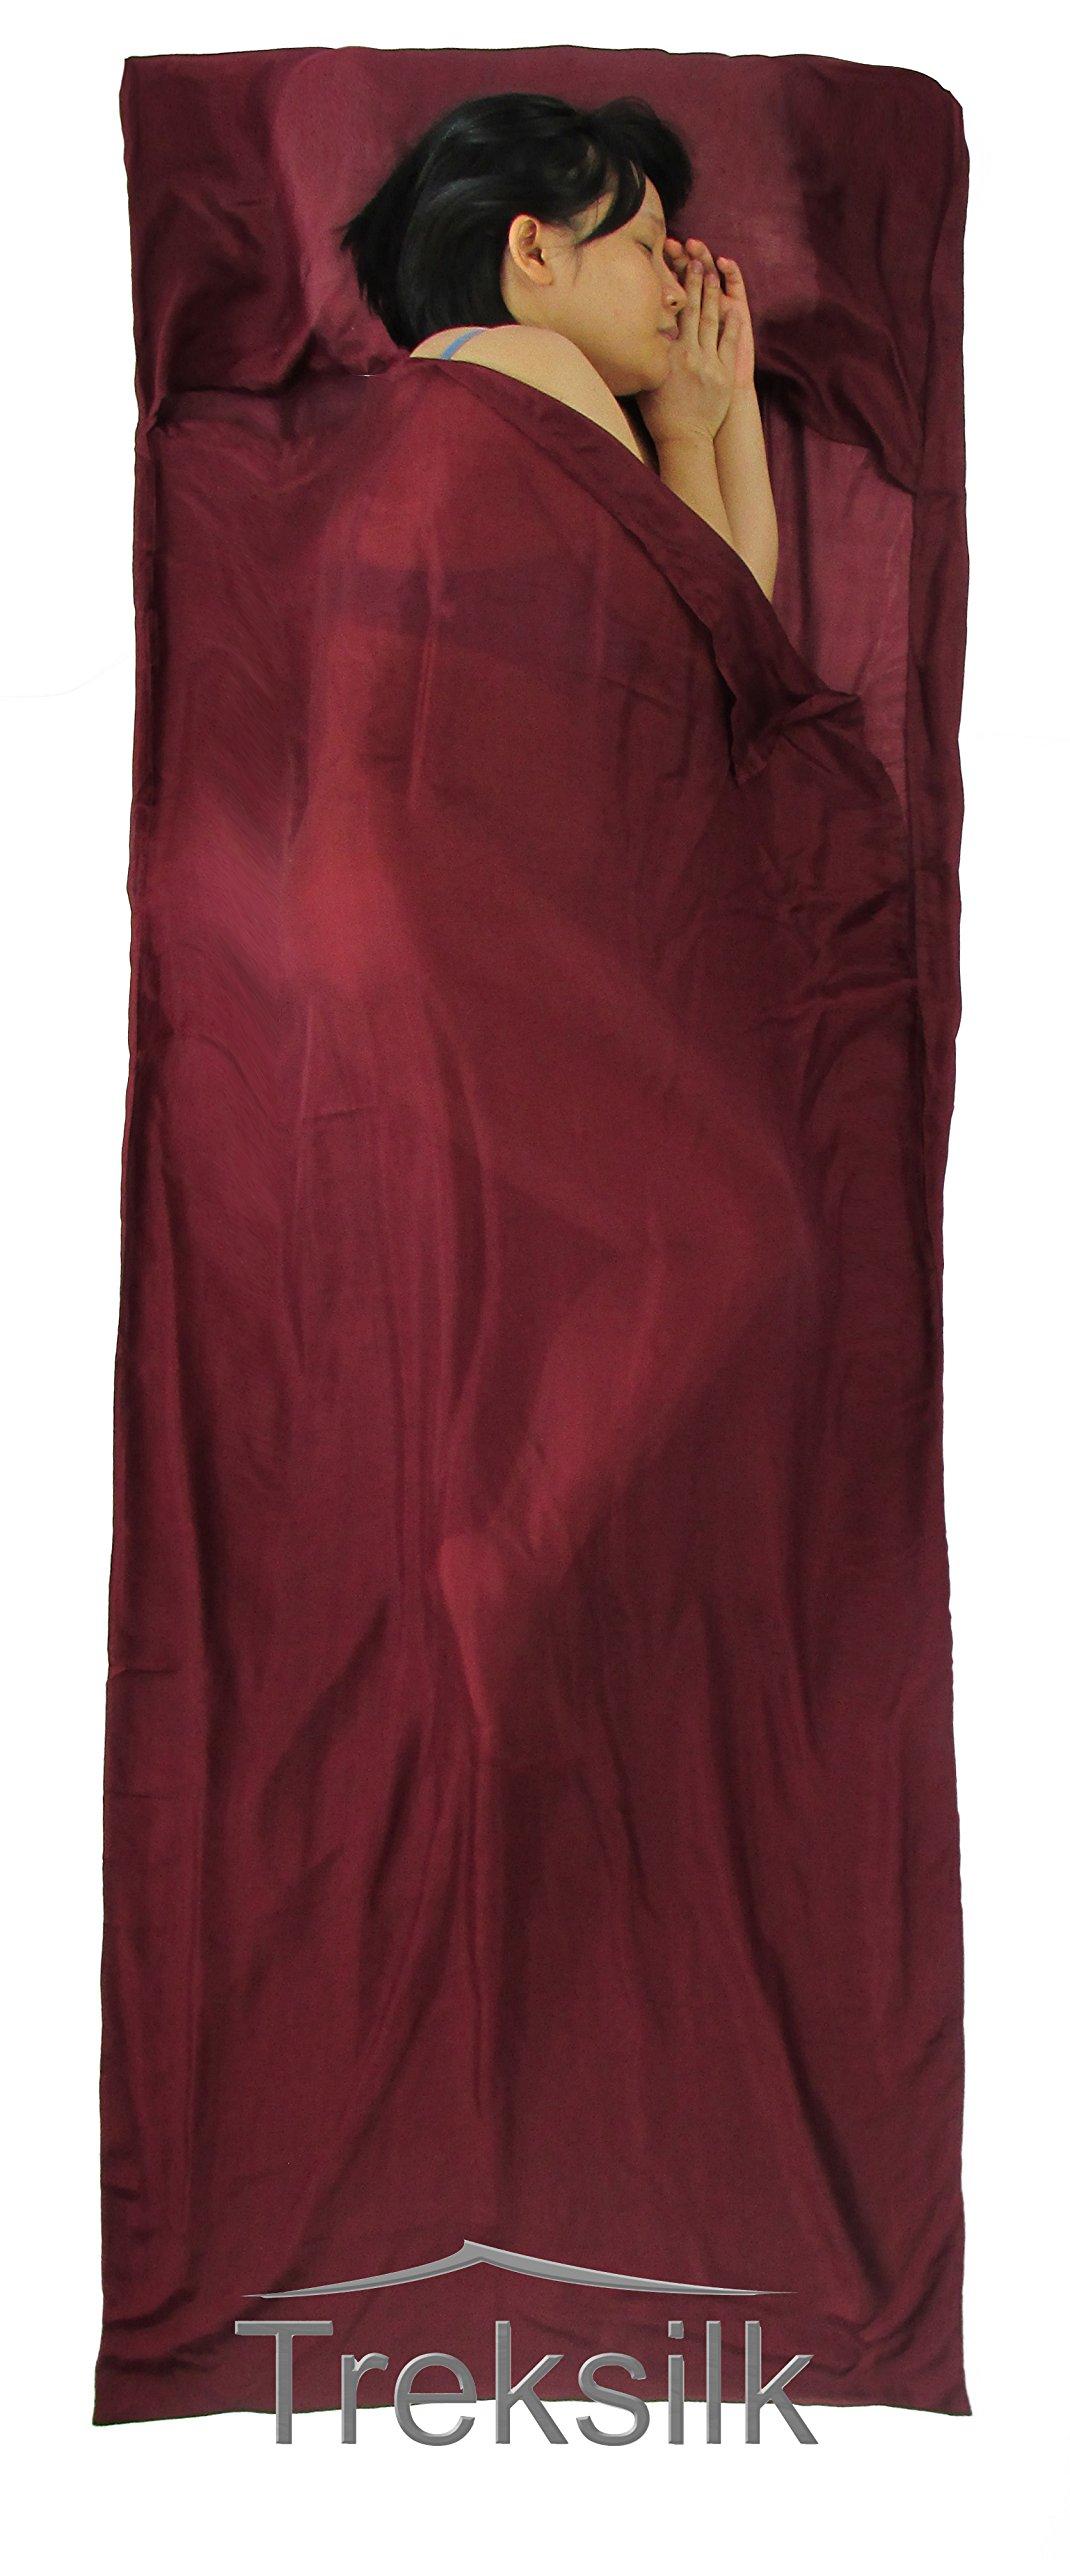 Treksilk: 240 cm! 100% Mulberry Silk Single Sleeping Bag Liner Travel Sheet Sack (Burgundy) by Treksilk